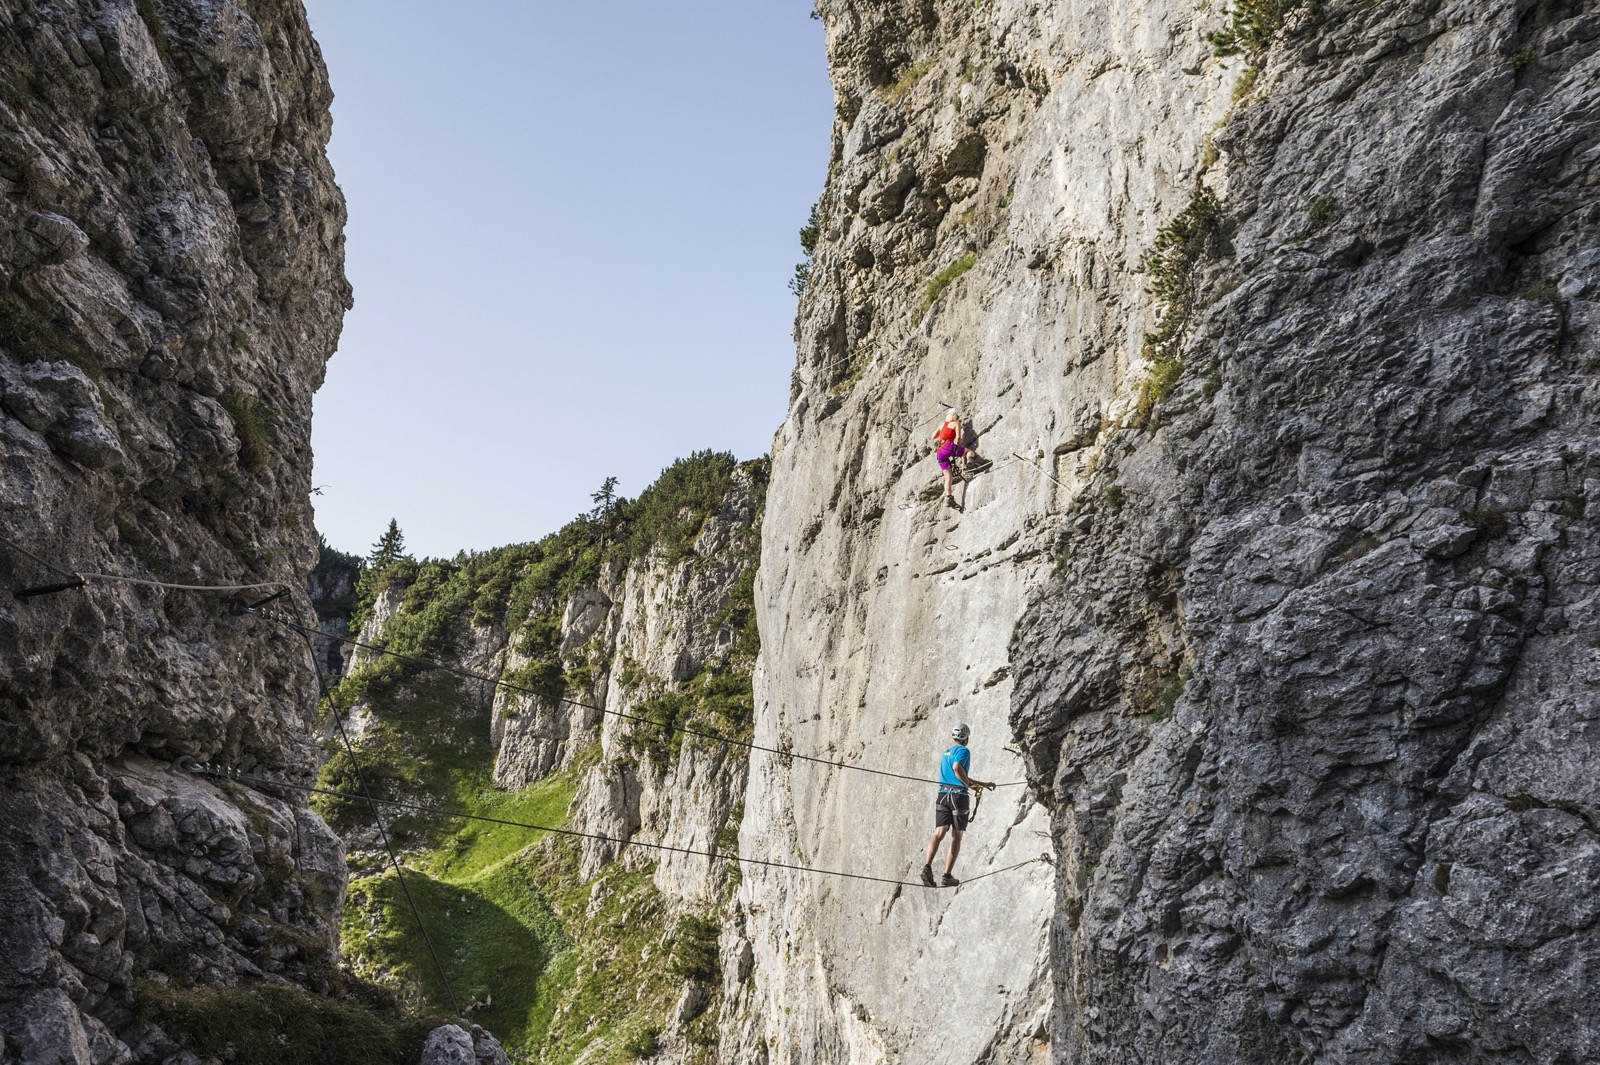 Klettersteig Klamm, Foto Peter von Feldbert I Climbers Paradise